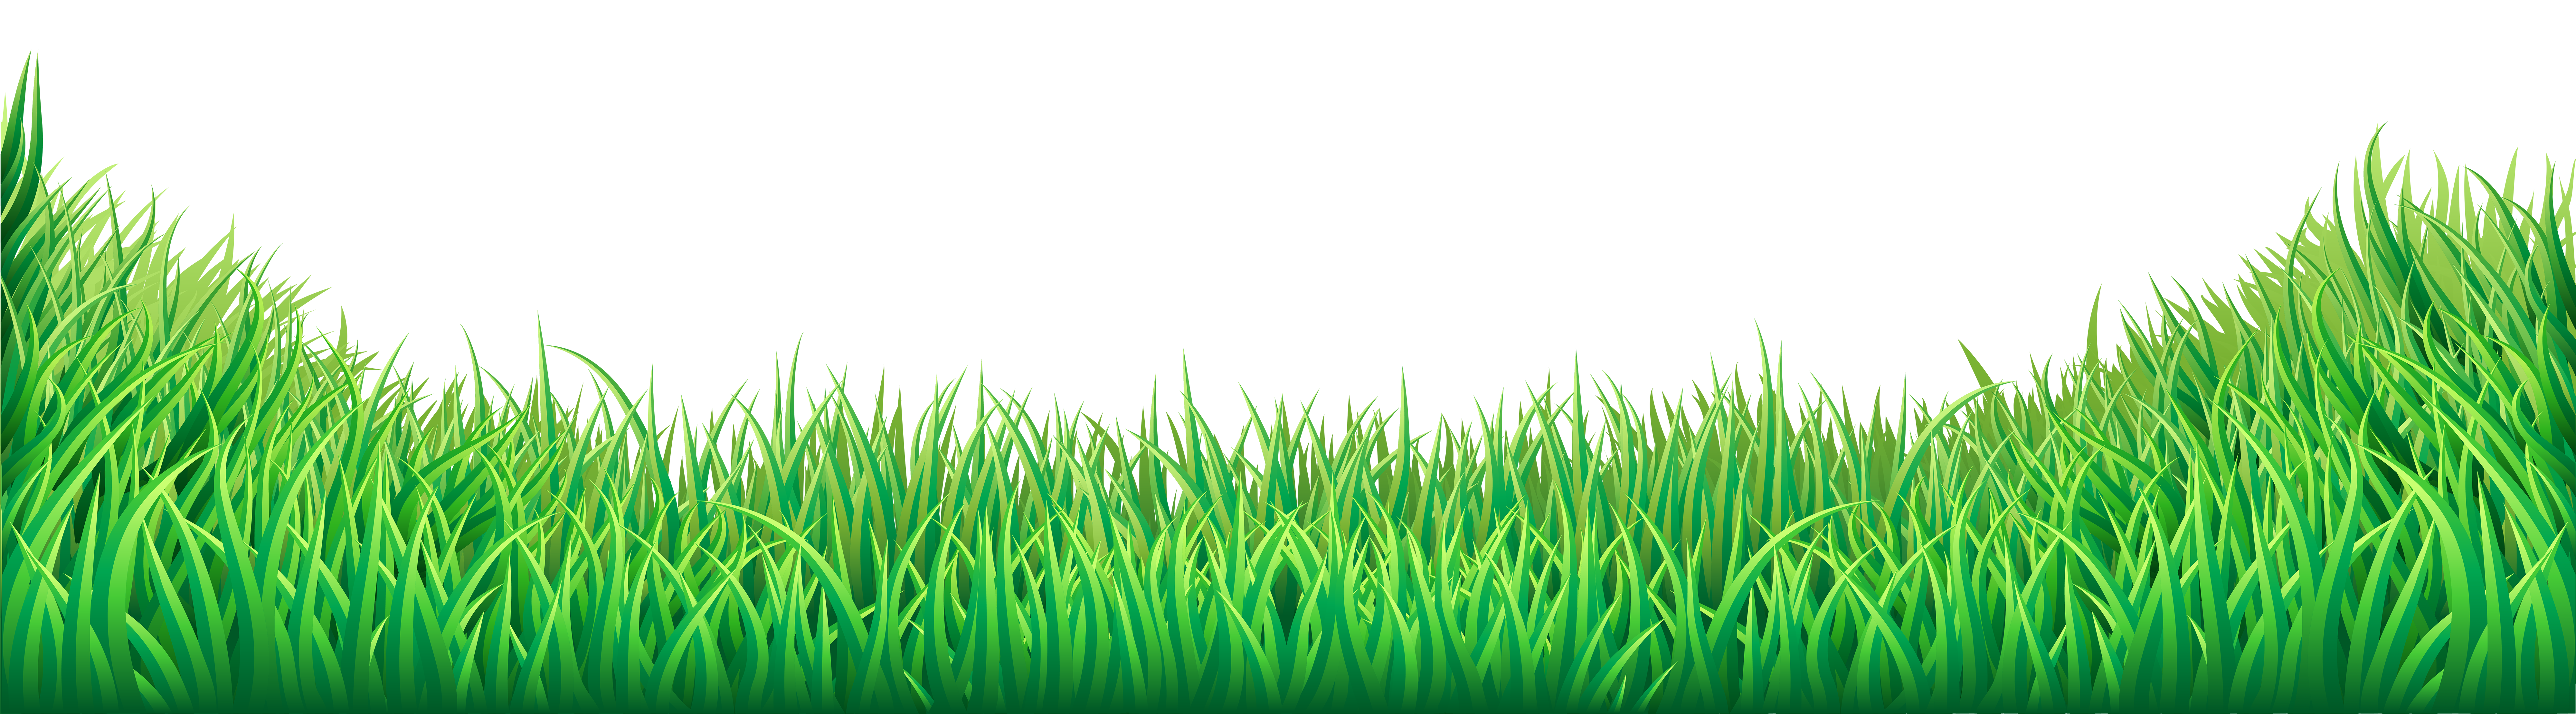 Clipart grass frame. Png transparent images pluspng